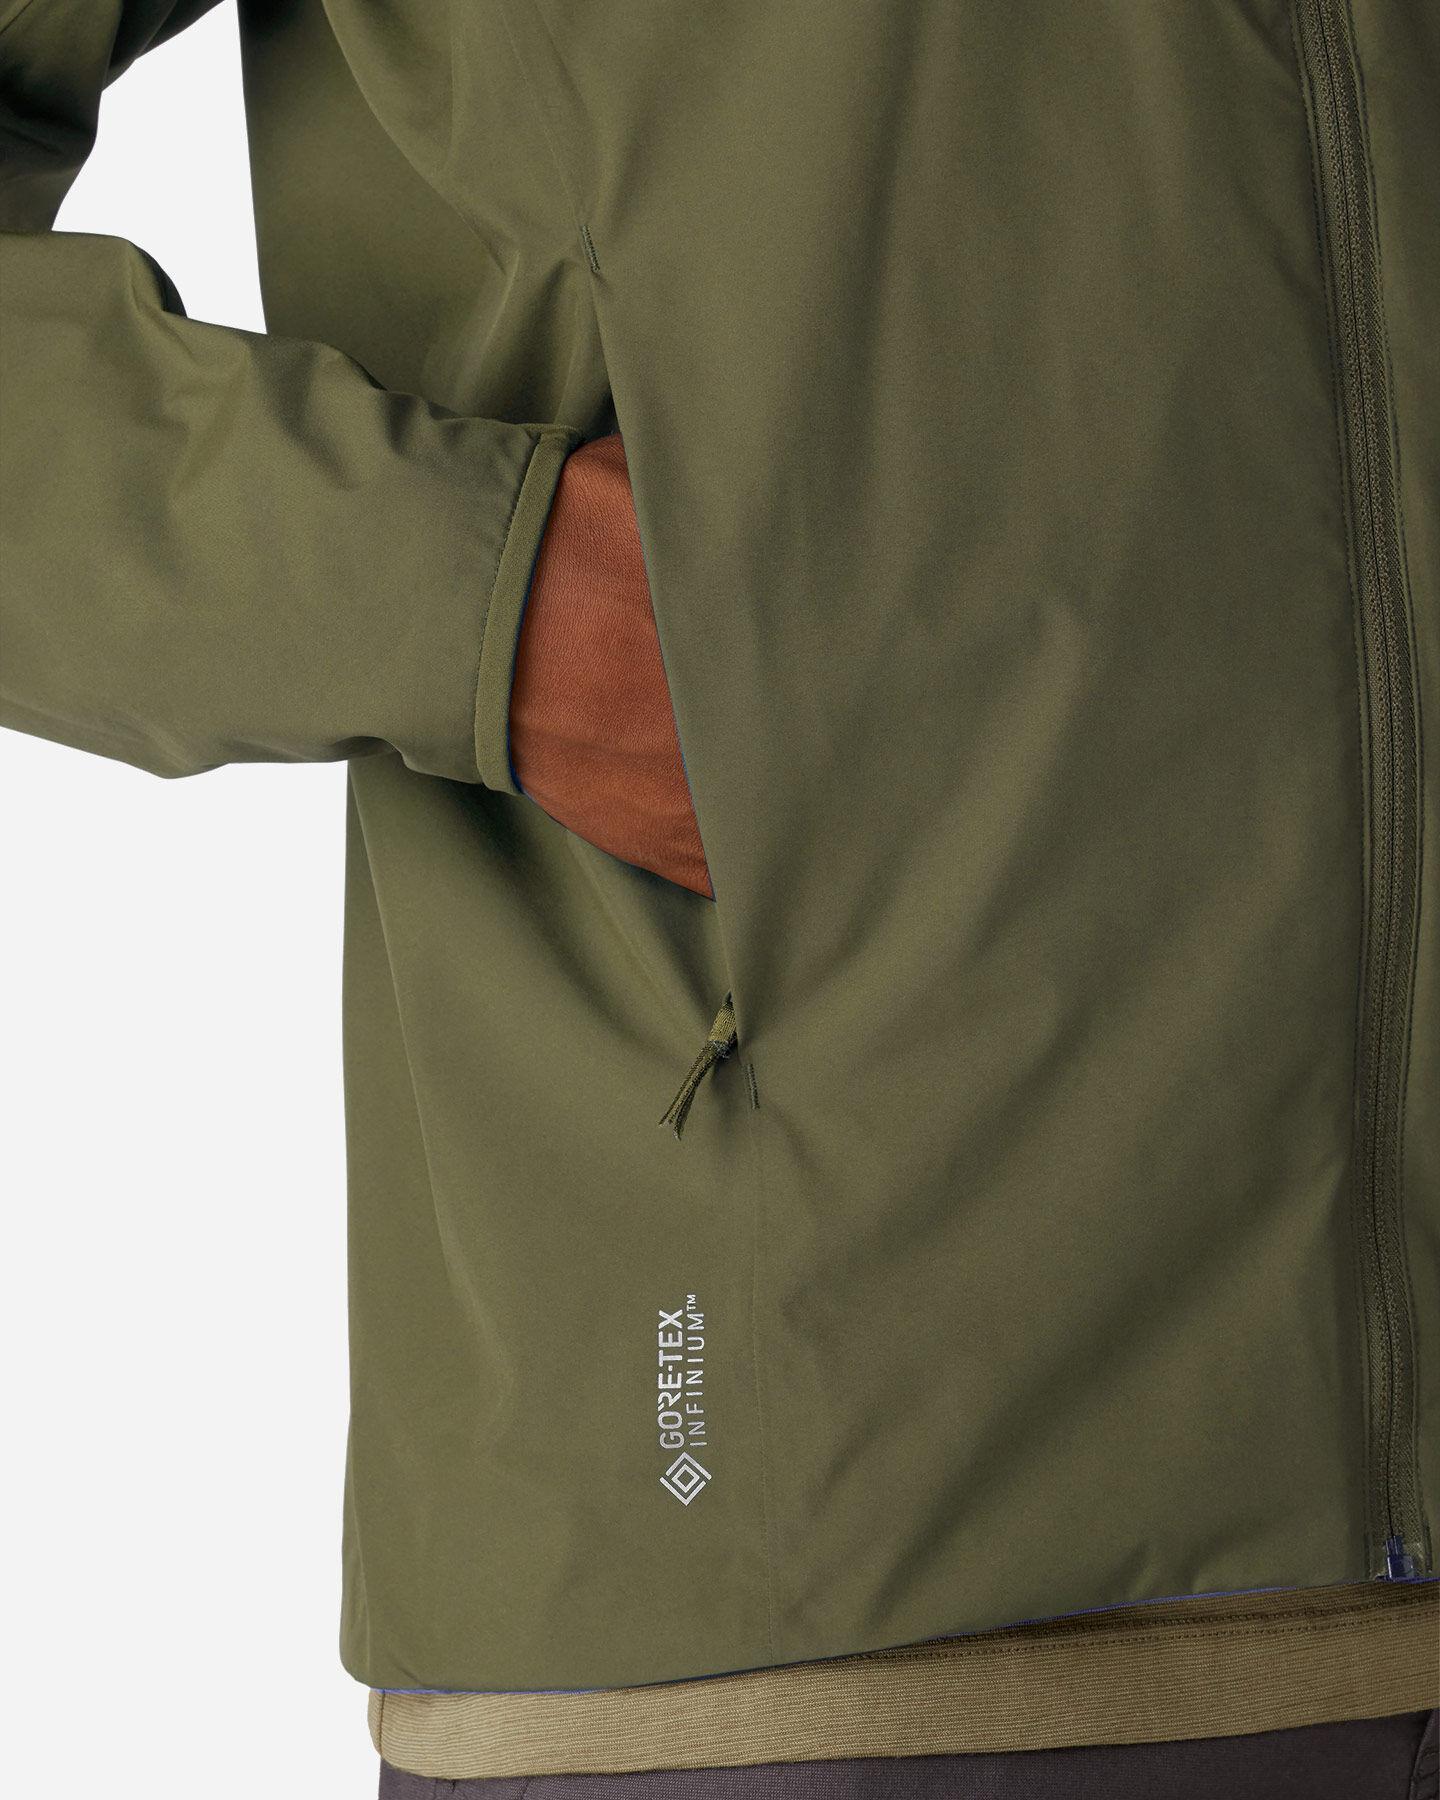 Giacca outdoor ARC'TERYX SOLANO GORE M S4075189 scatto 4